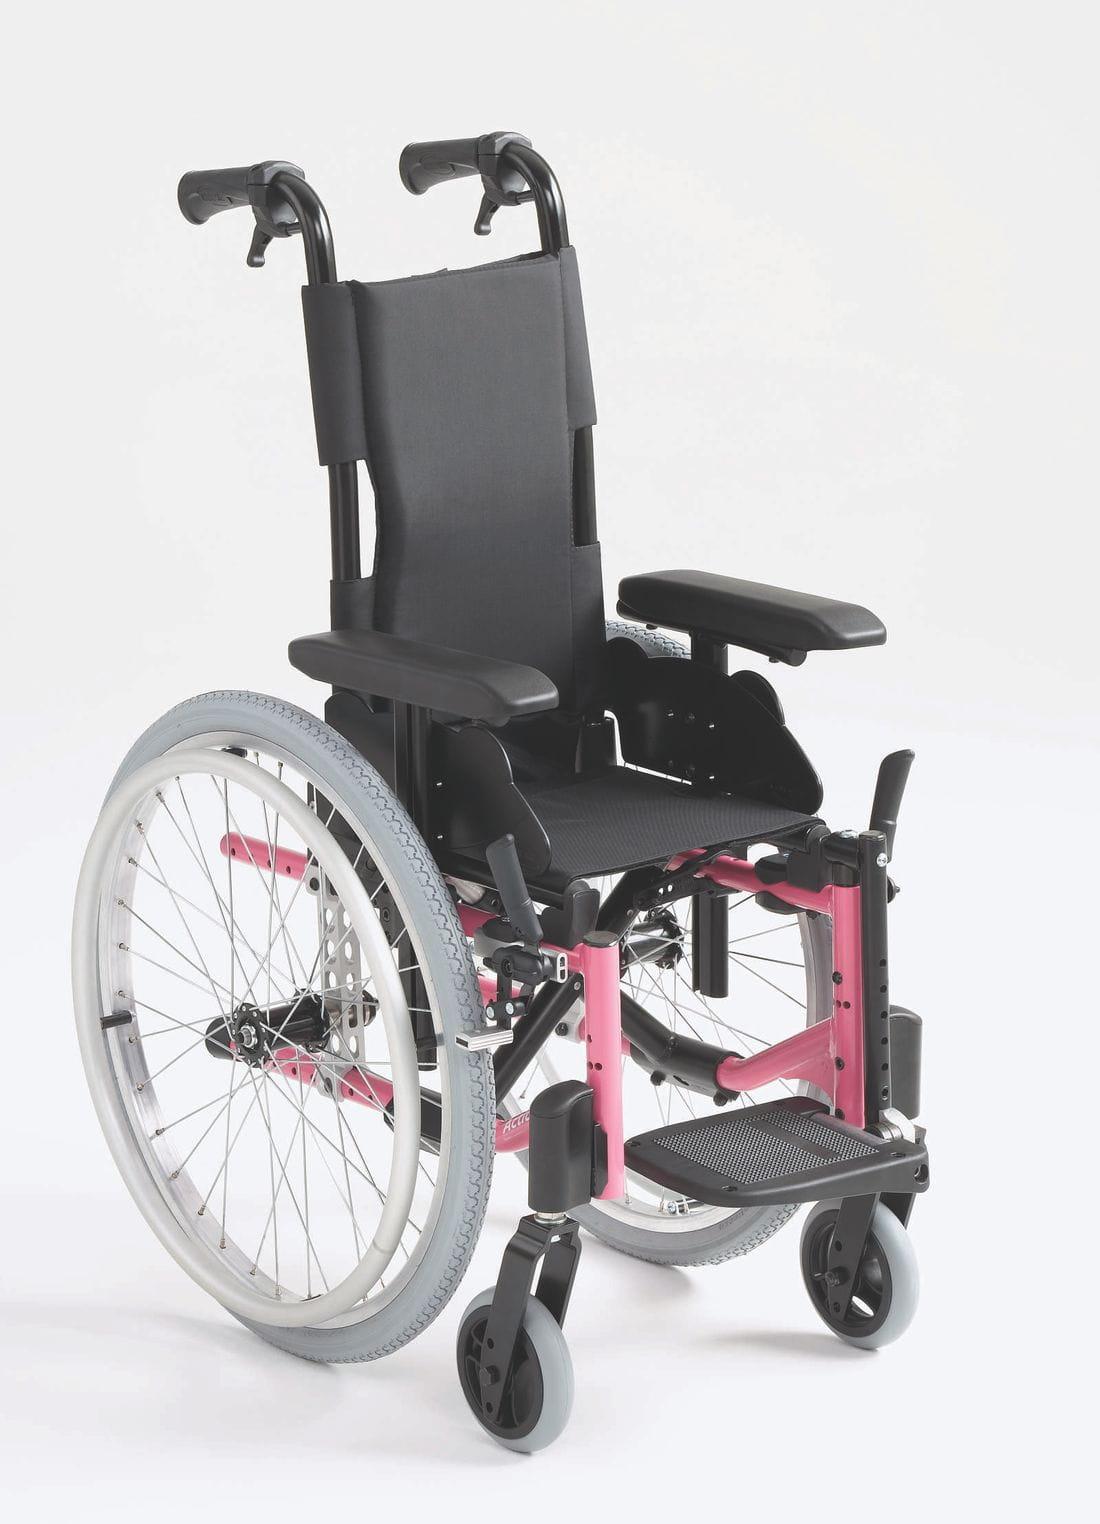 Silla de ruedas de niños A3JUNIOR CV06